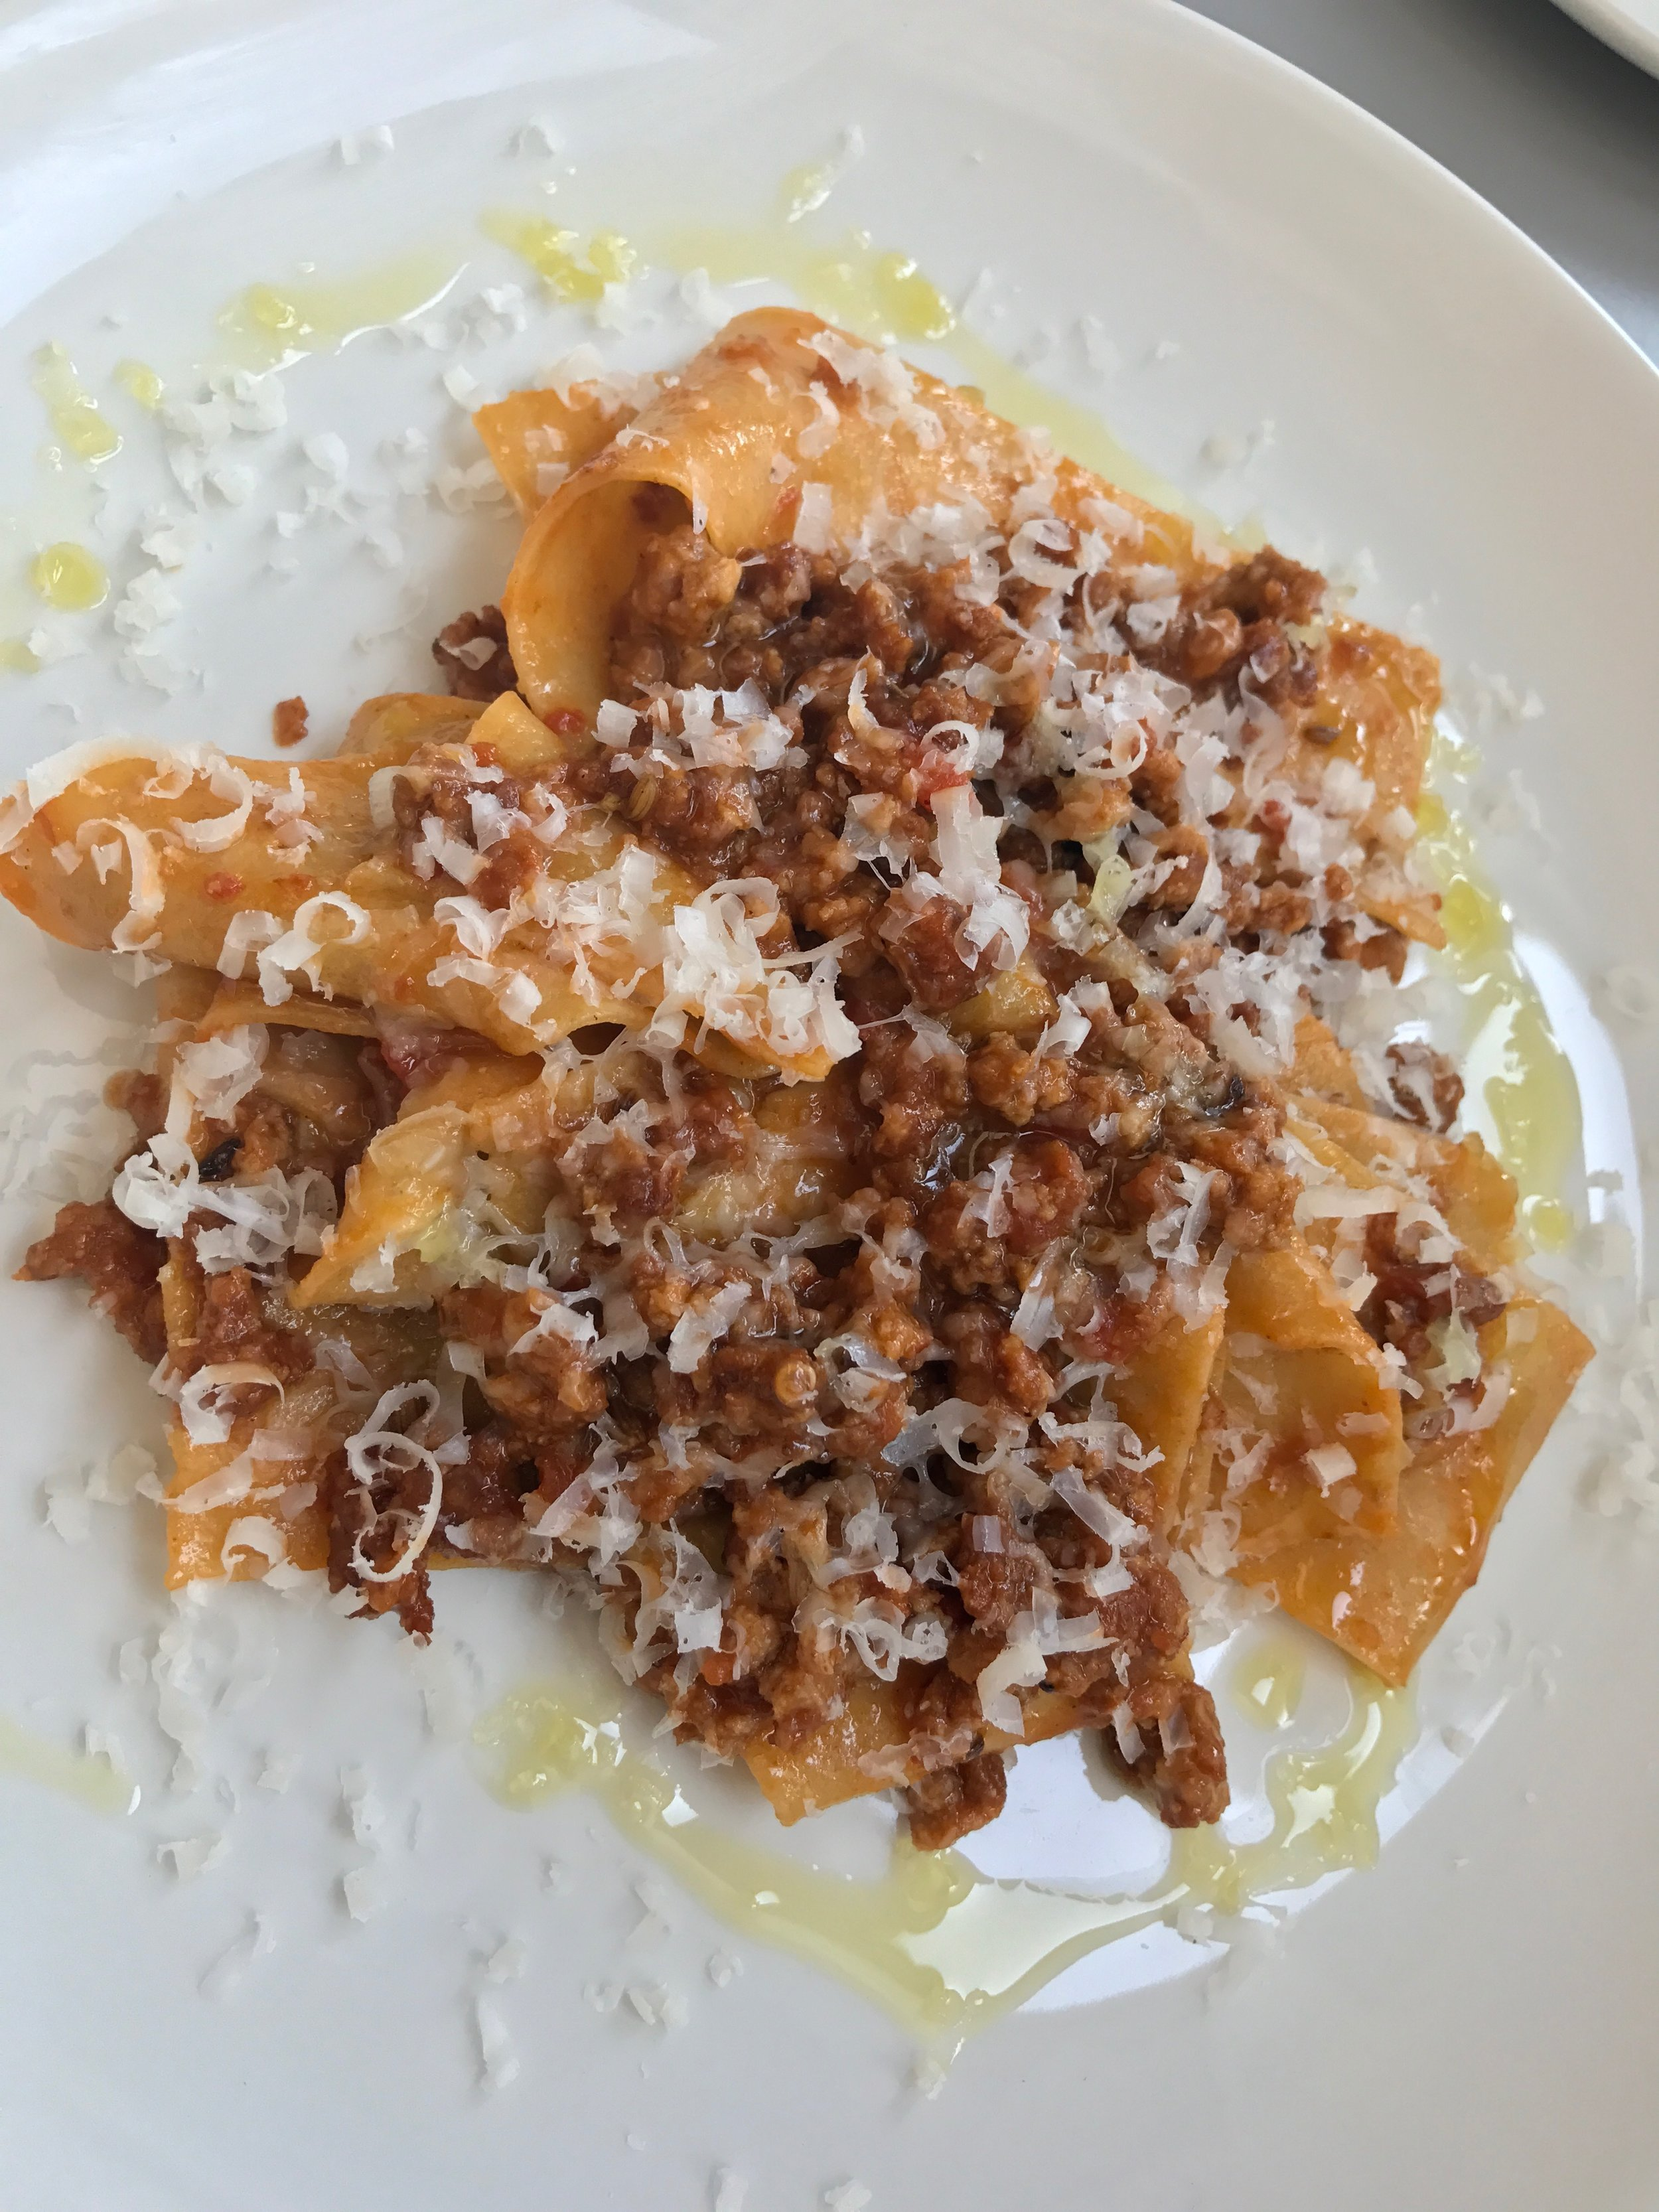 Pork and fennel ragu pappardelle